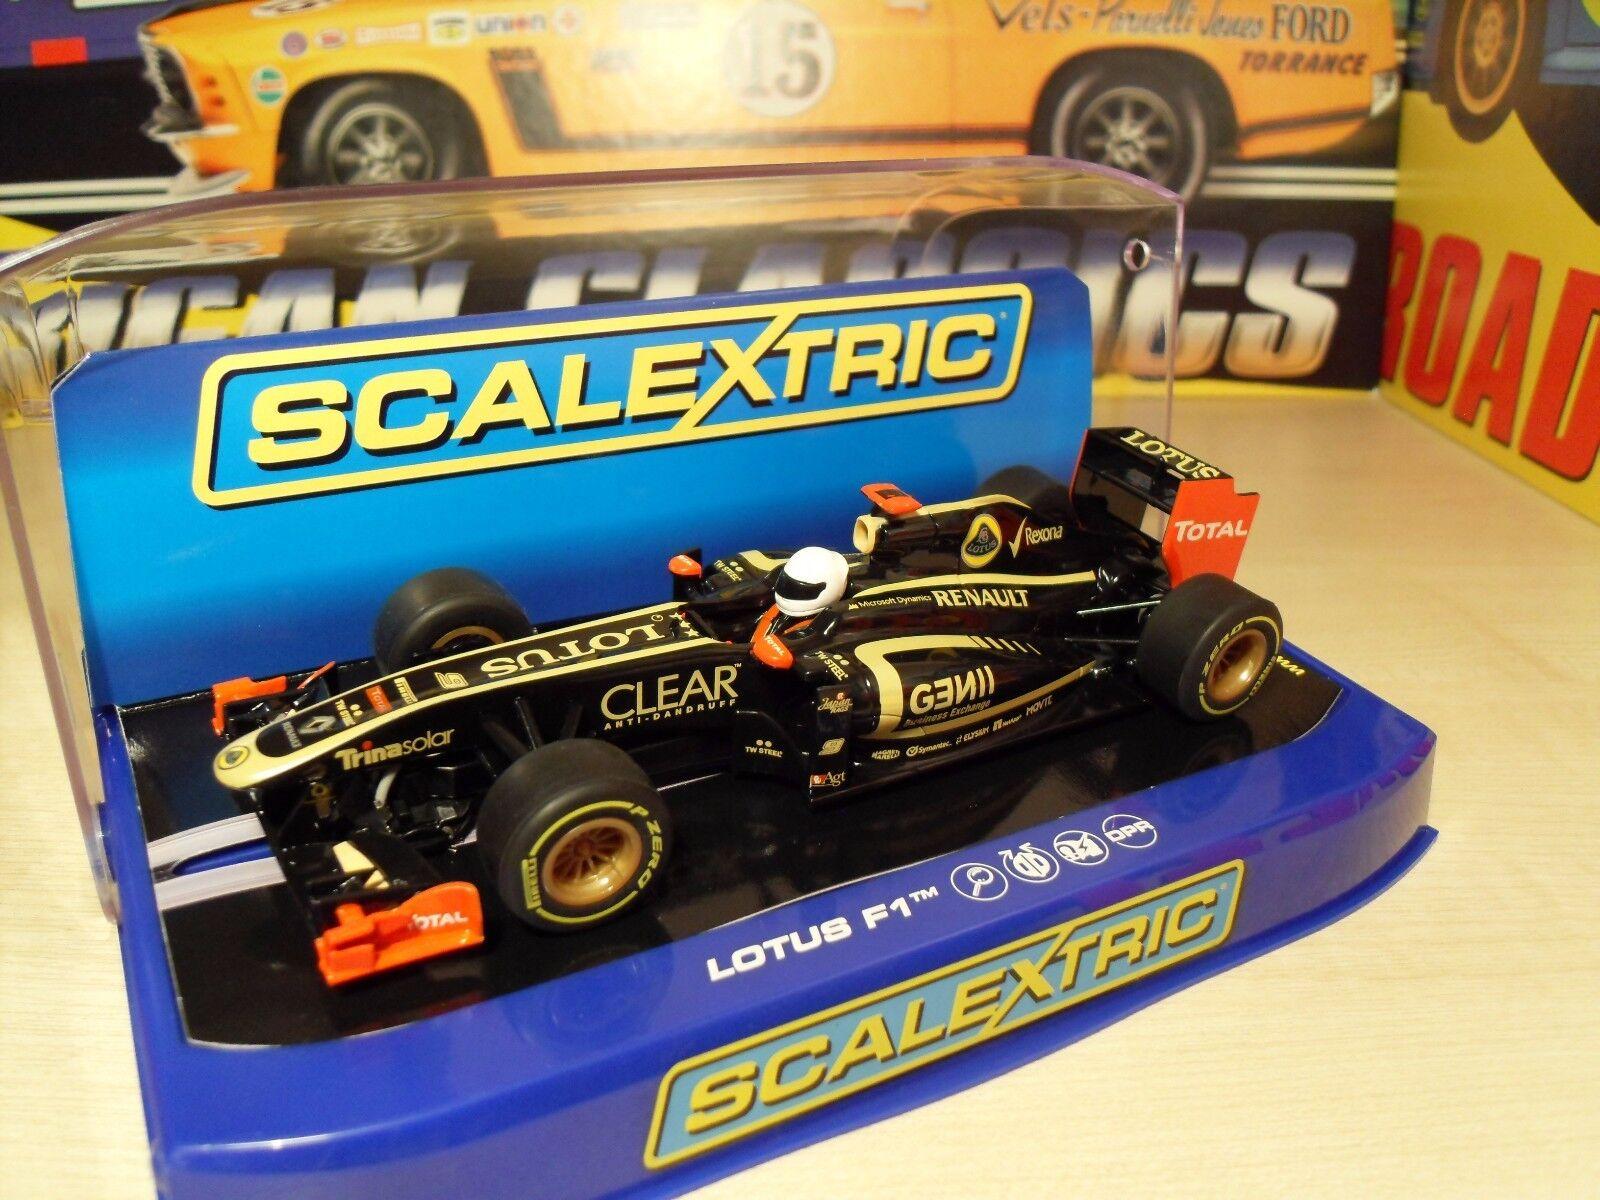 Scalextric C3262 LOTUS F1  Kimi Raikkonen  - Brand New in Box